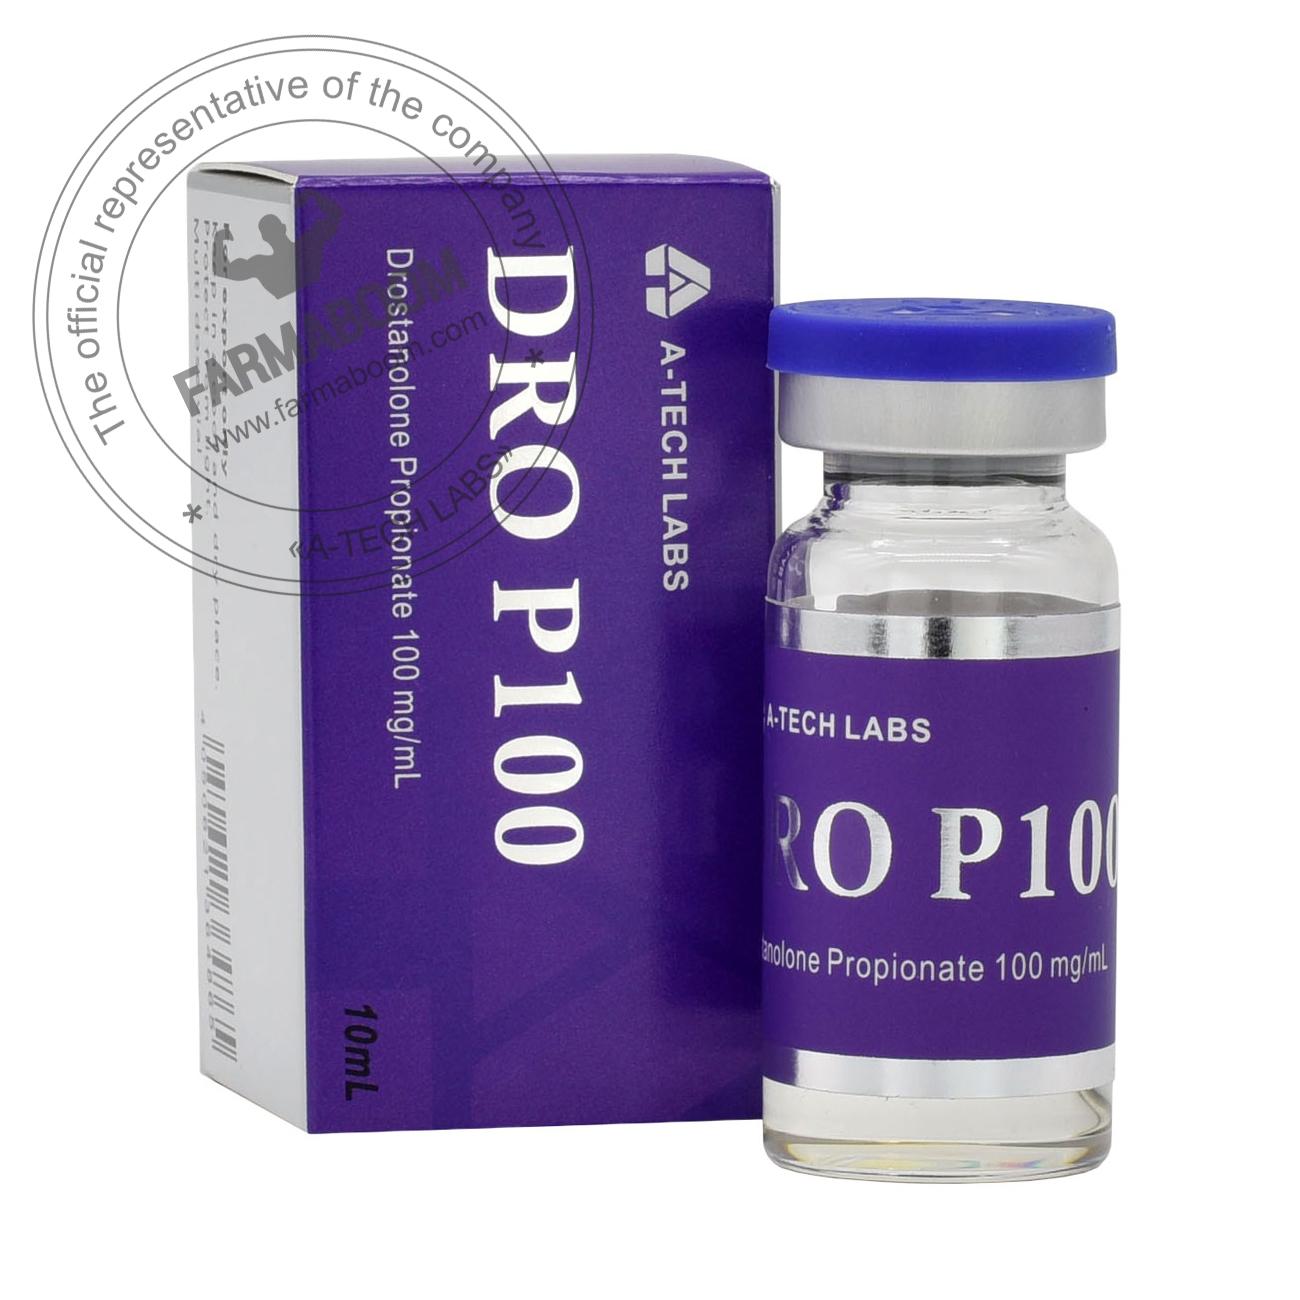 dro_p100_A-TECH LABS_farmaboom_com